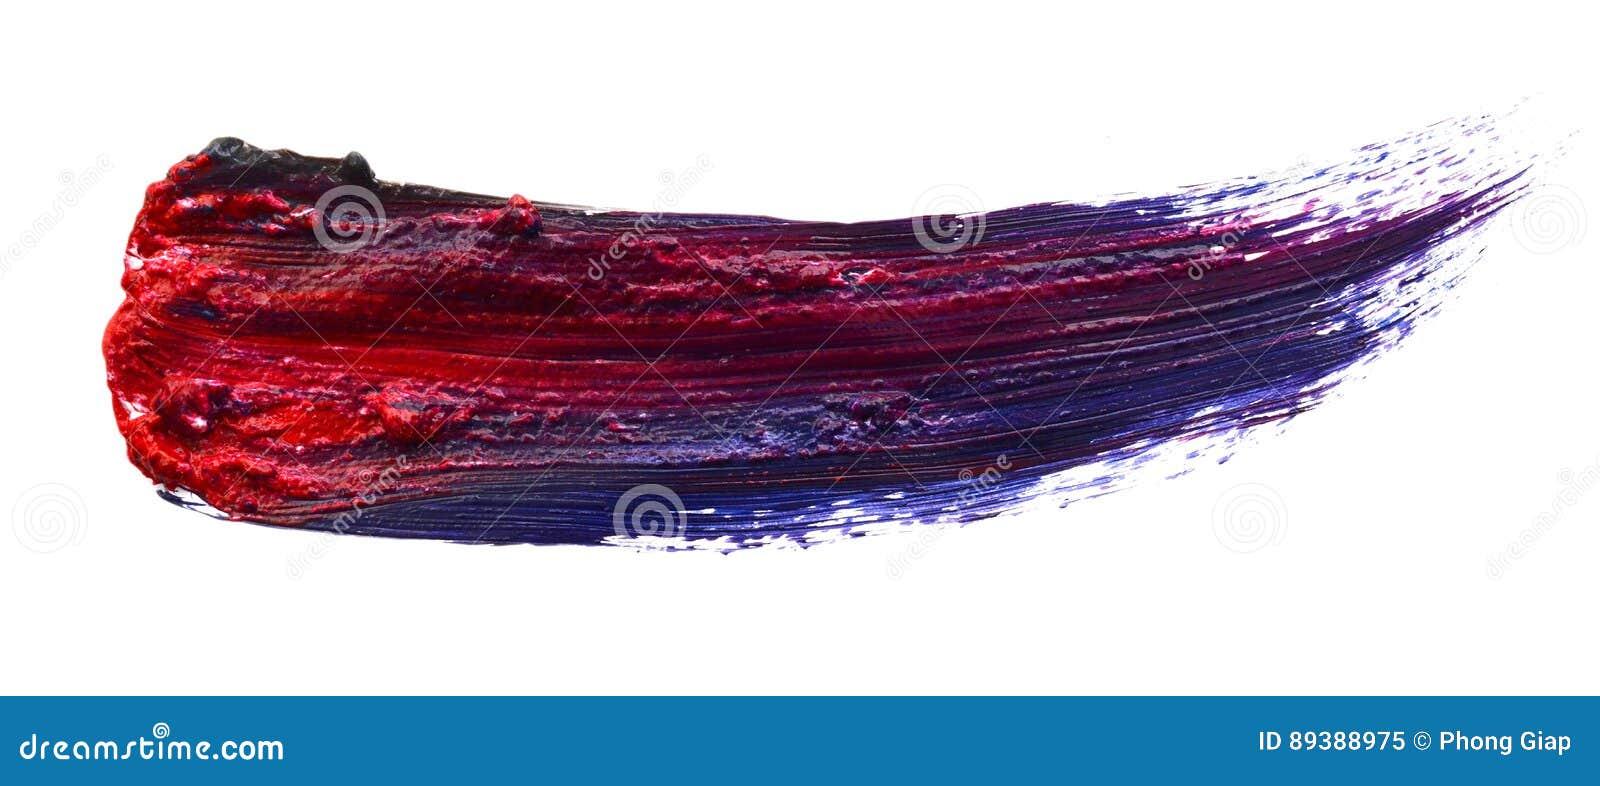 Комплект 4 изогнул handmade изолированные ходы кисти масла изолированными на белой предпосылке Текстура хода щетки детали или кру